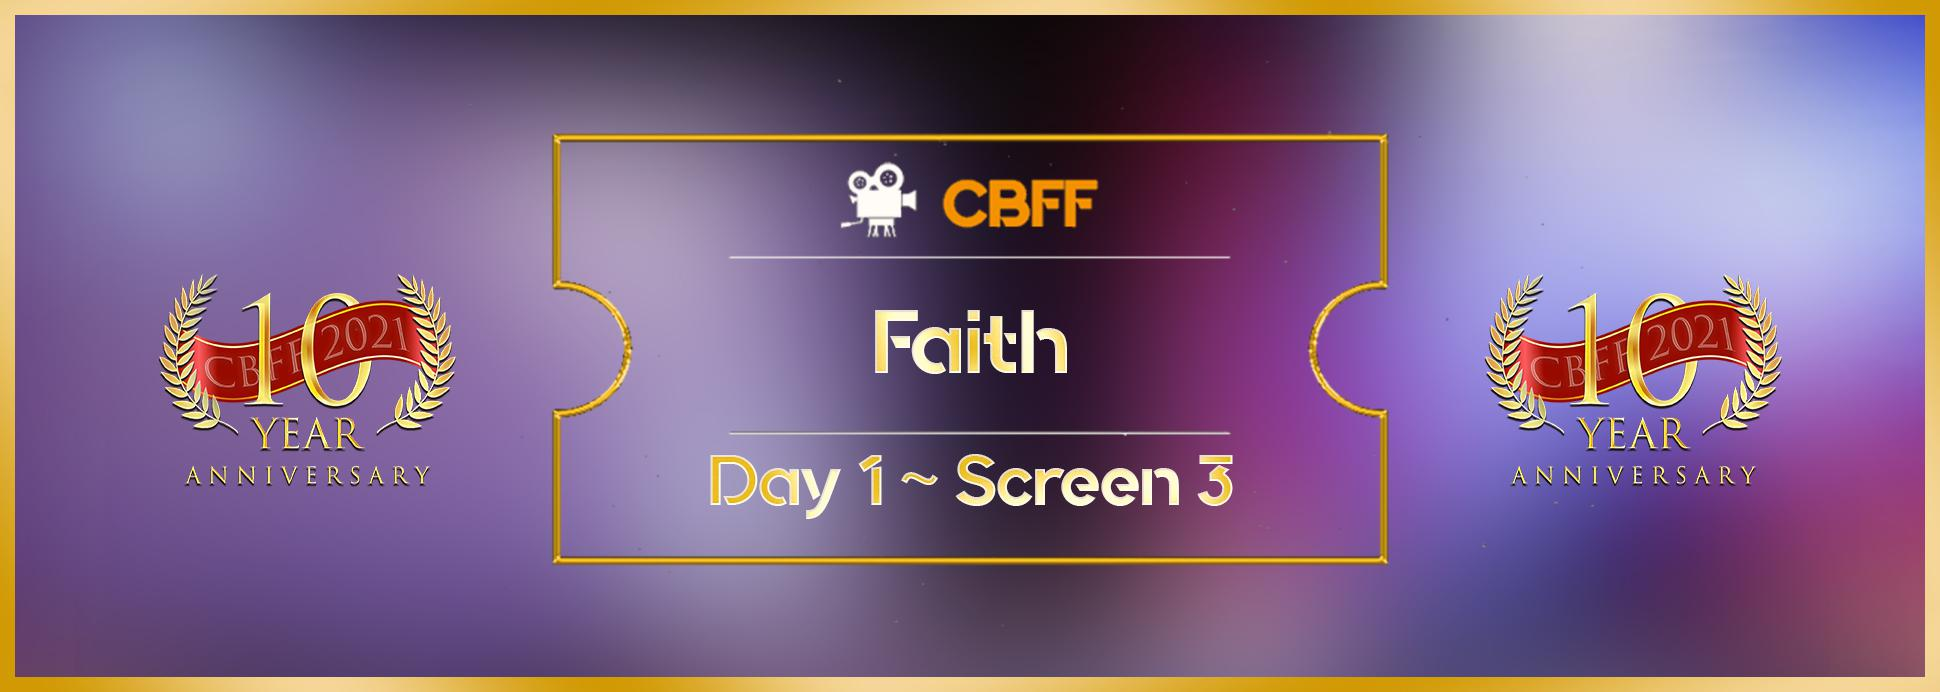 Day 1, Screen 3: Faith Short Film